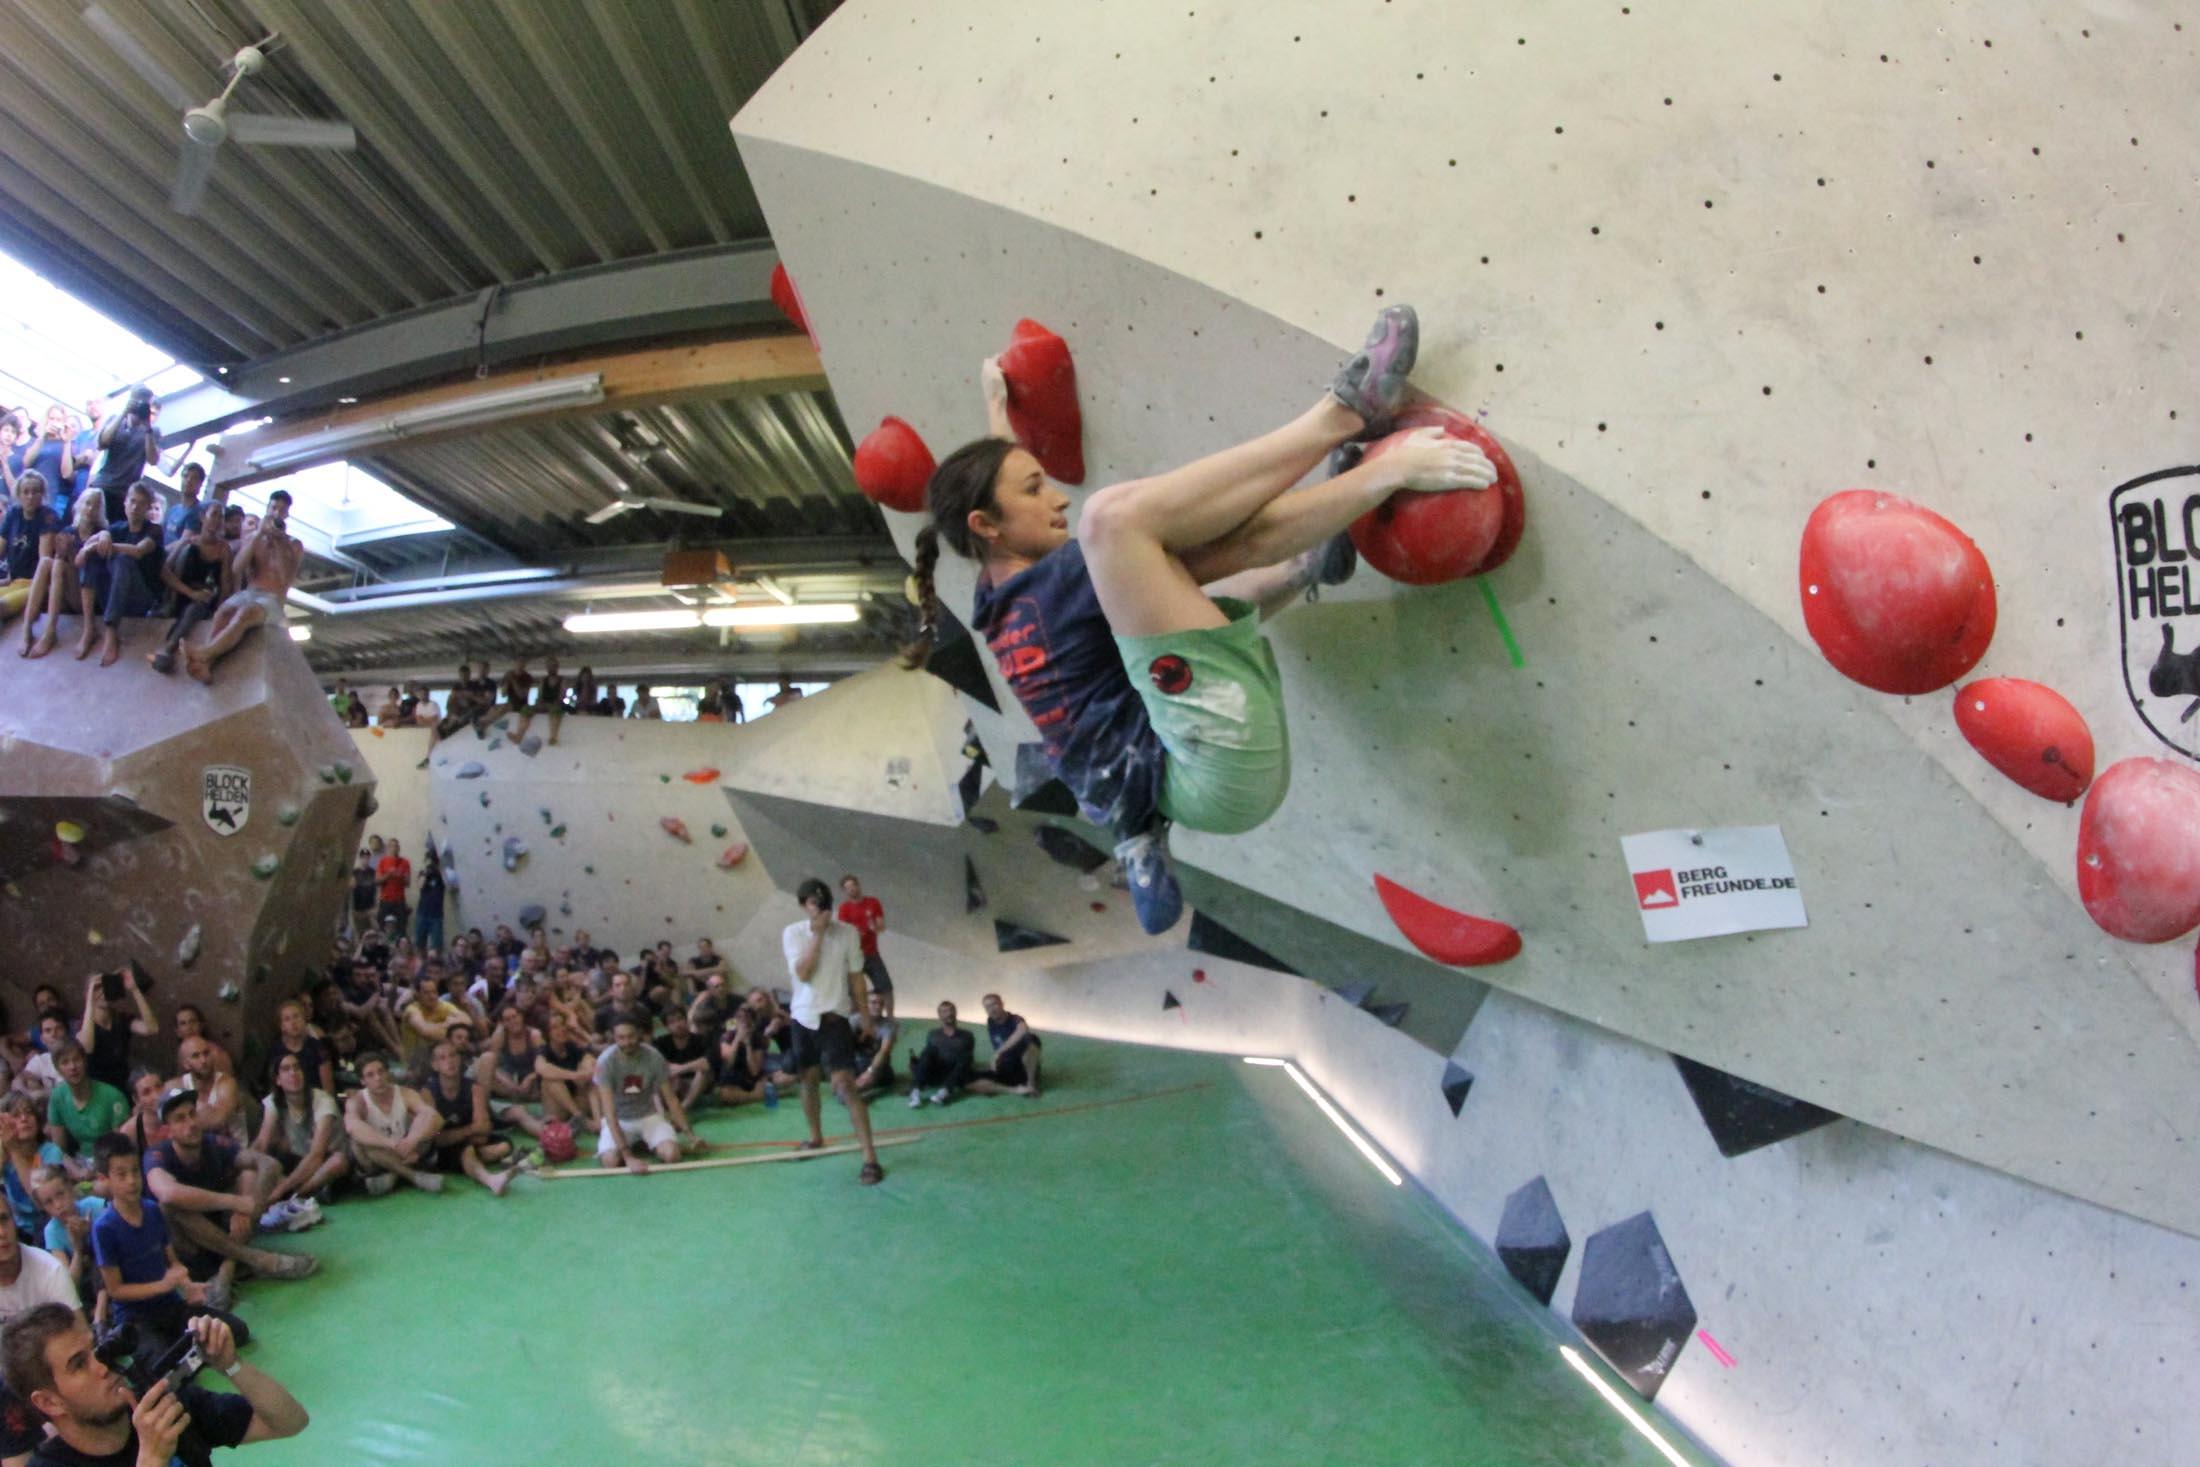 Finale, internationaler bouldercup Frankenjura 2016, BLOCKHELDEN Erlangen, Mammut, Bergfreunde.de, Boulderwettkampf07092016636